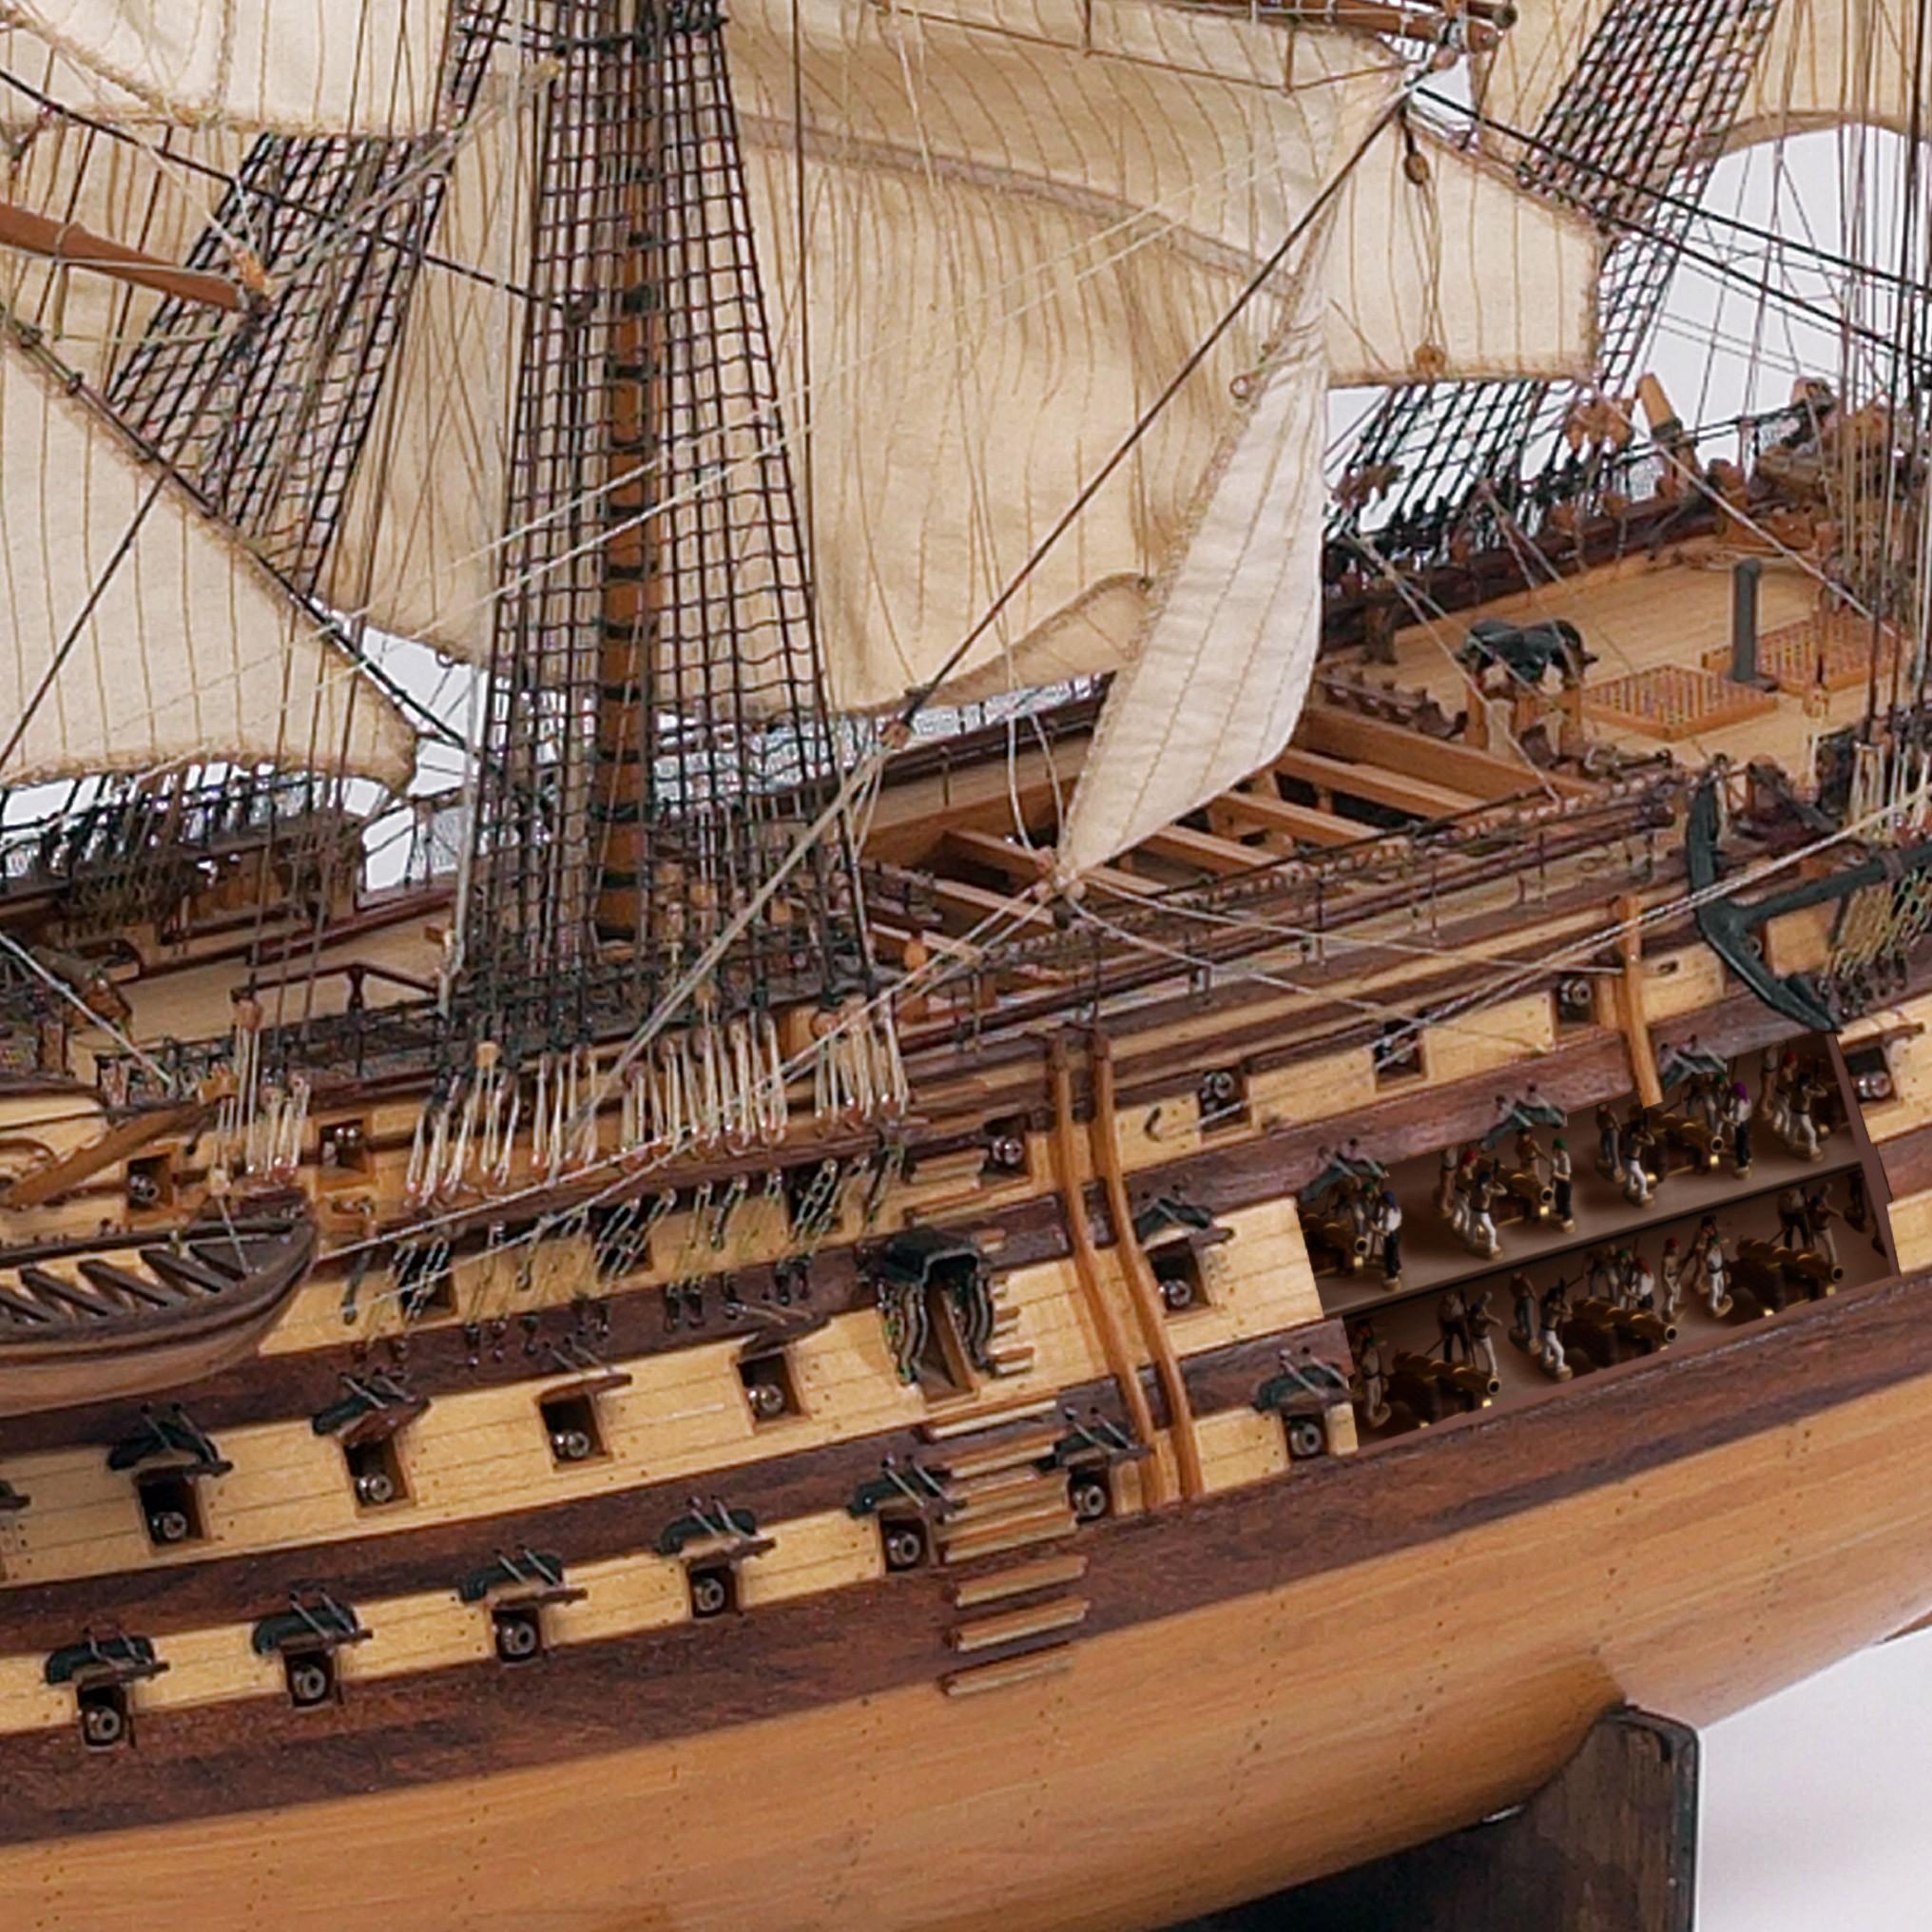 hms victory model sailing ship 1 84 scale kit